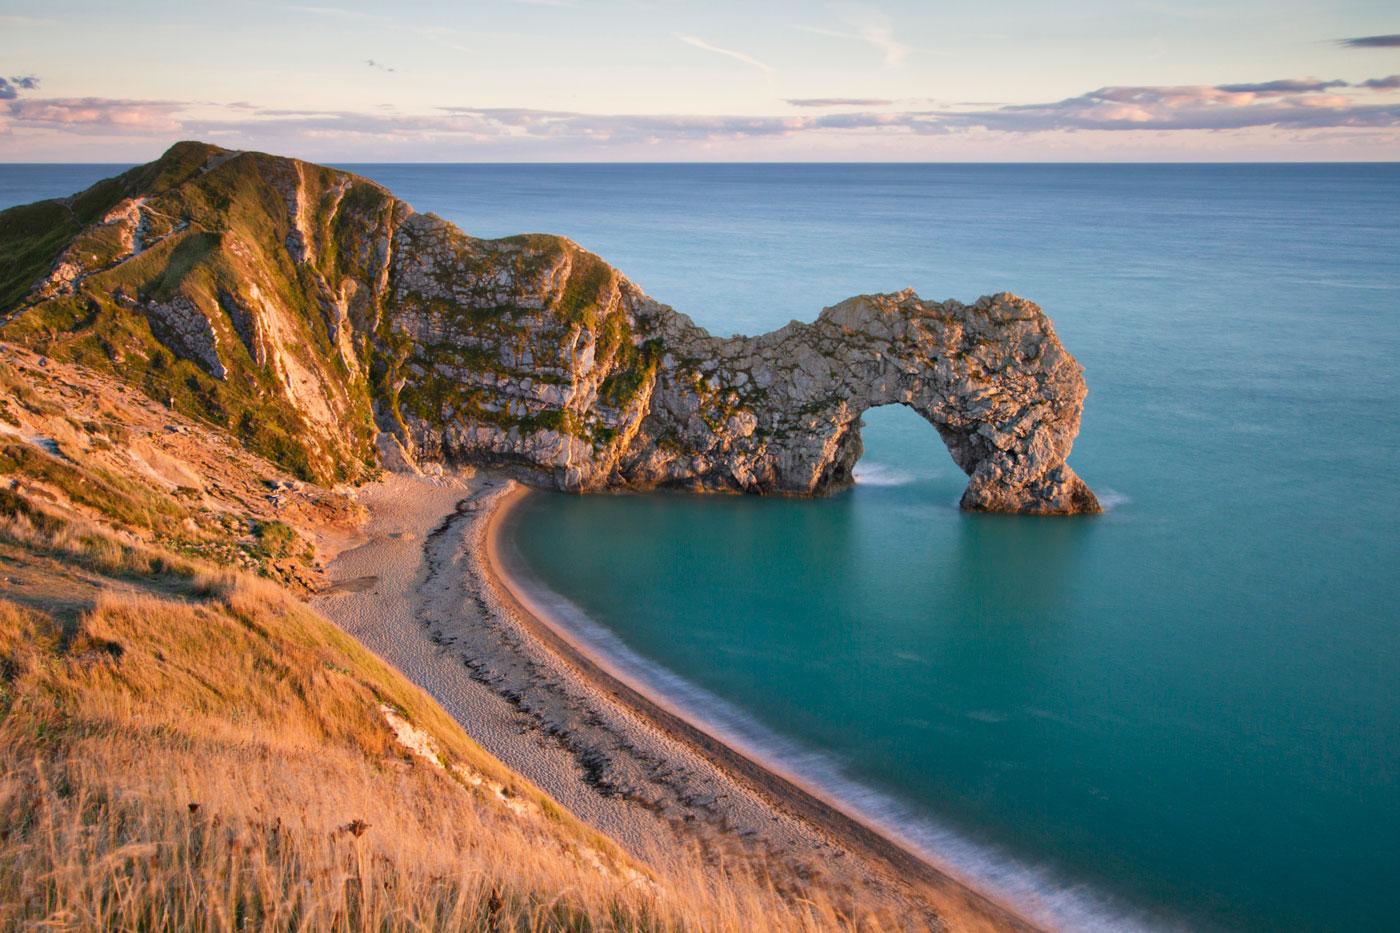 Walk: Lulworth Cove, Durdle Door and Bat's Head, Dorset